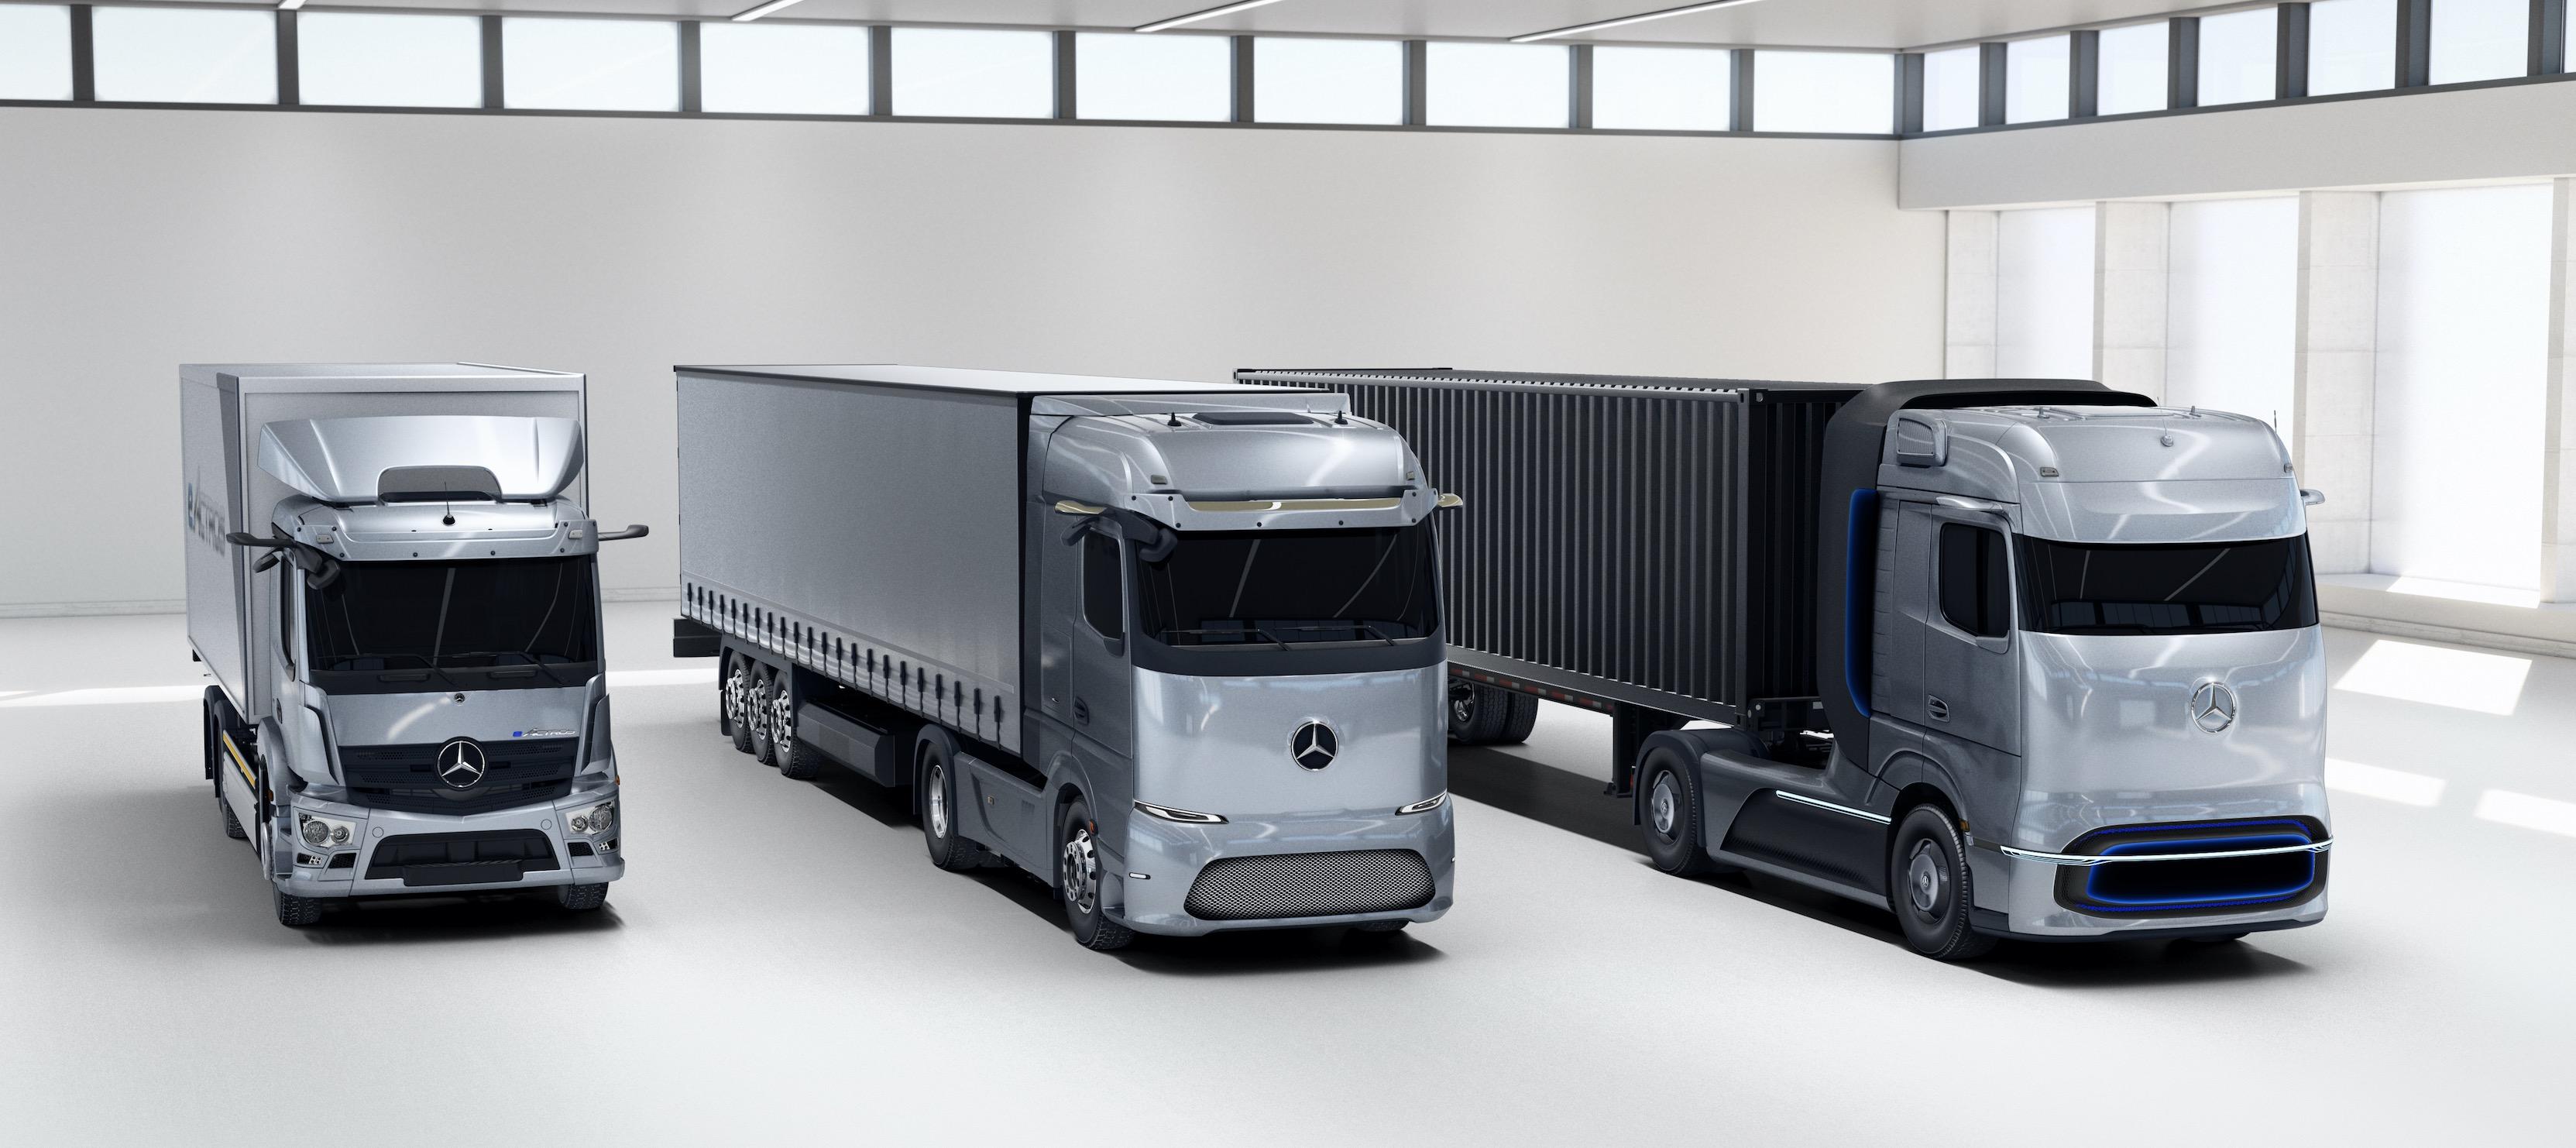 Mercedes-Benz unveils eActros LongHaul electric truck and concept fuel... image